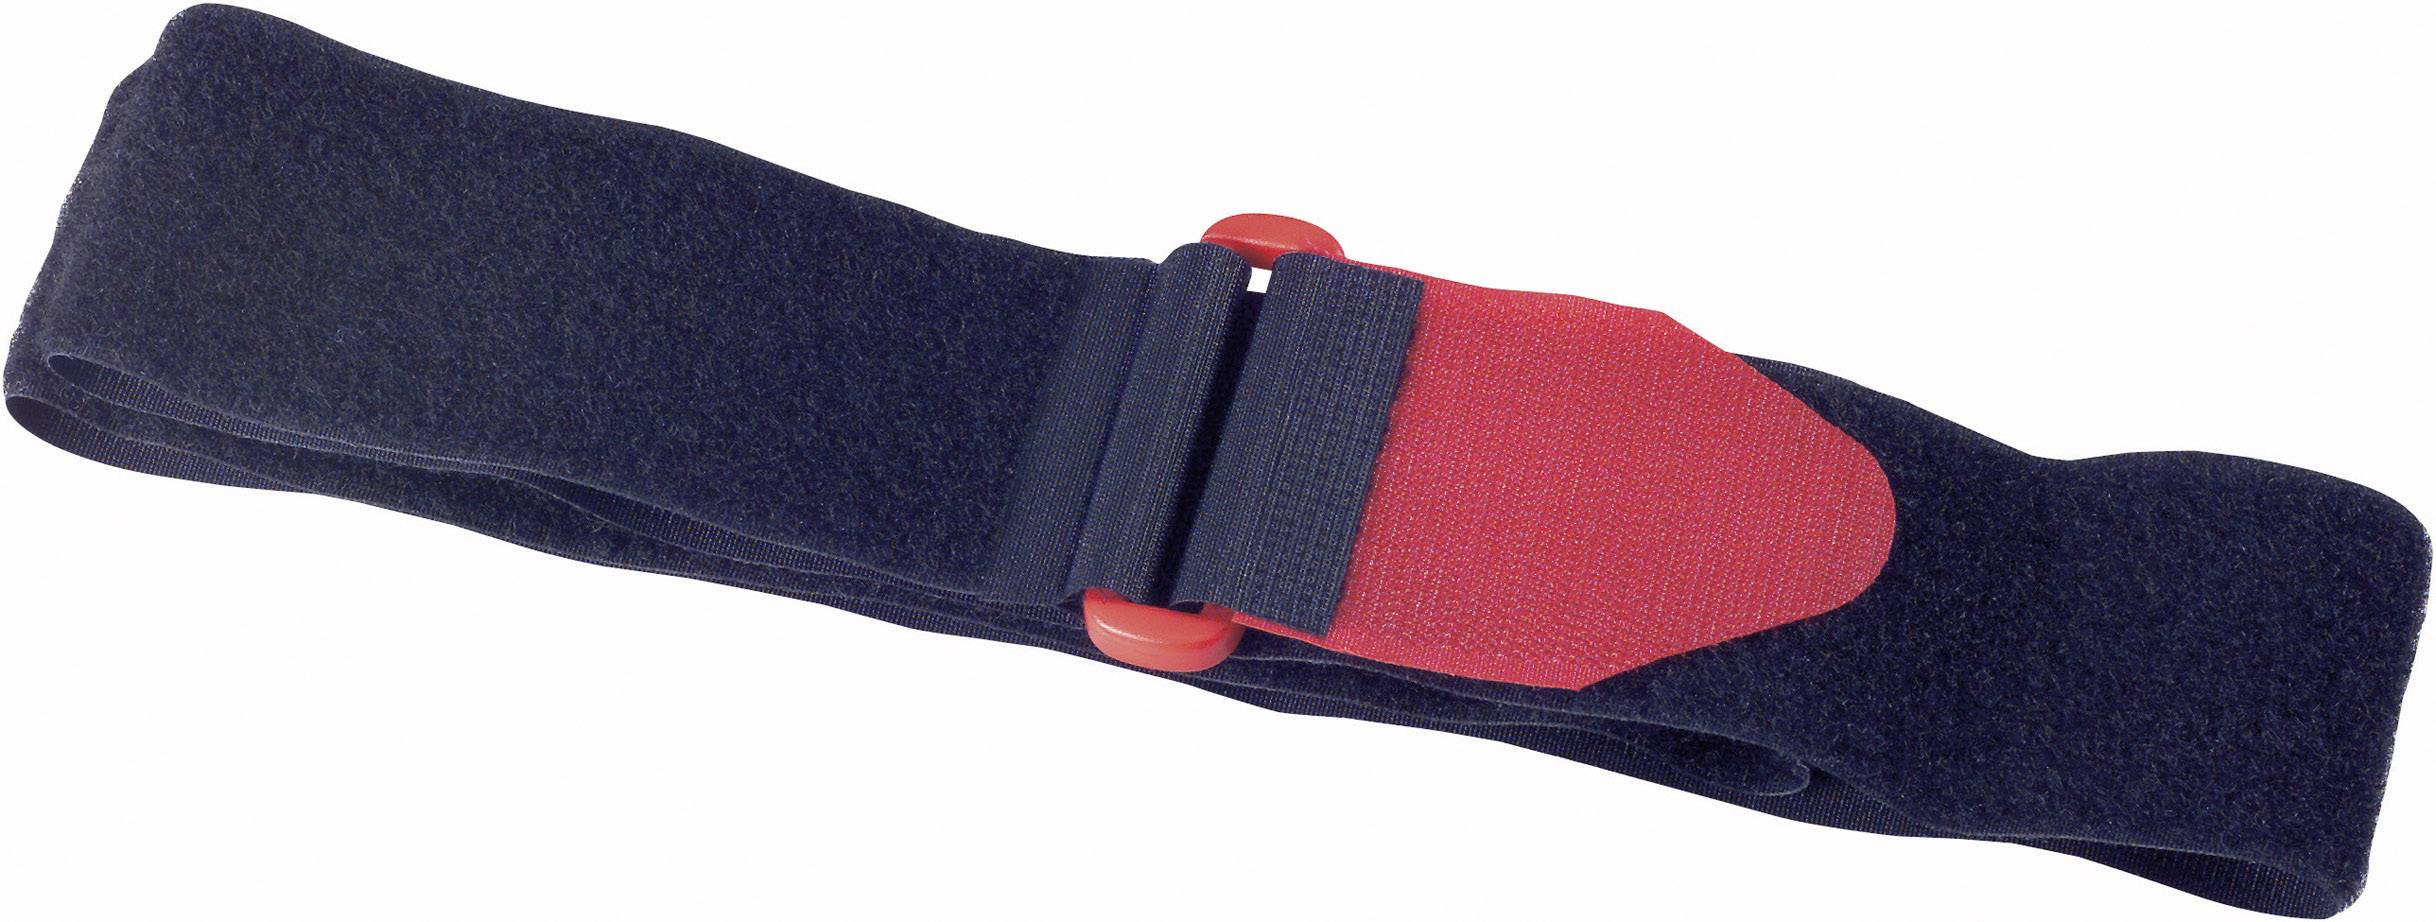 Pásik so suchým zipsom Fastech F101-25-300-5, (d x š) 300 mm x 25 mm, čierna, červená, 5 ks